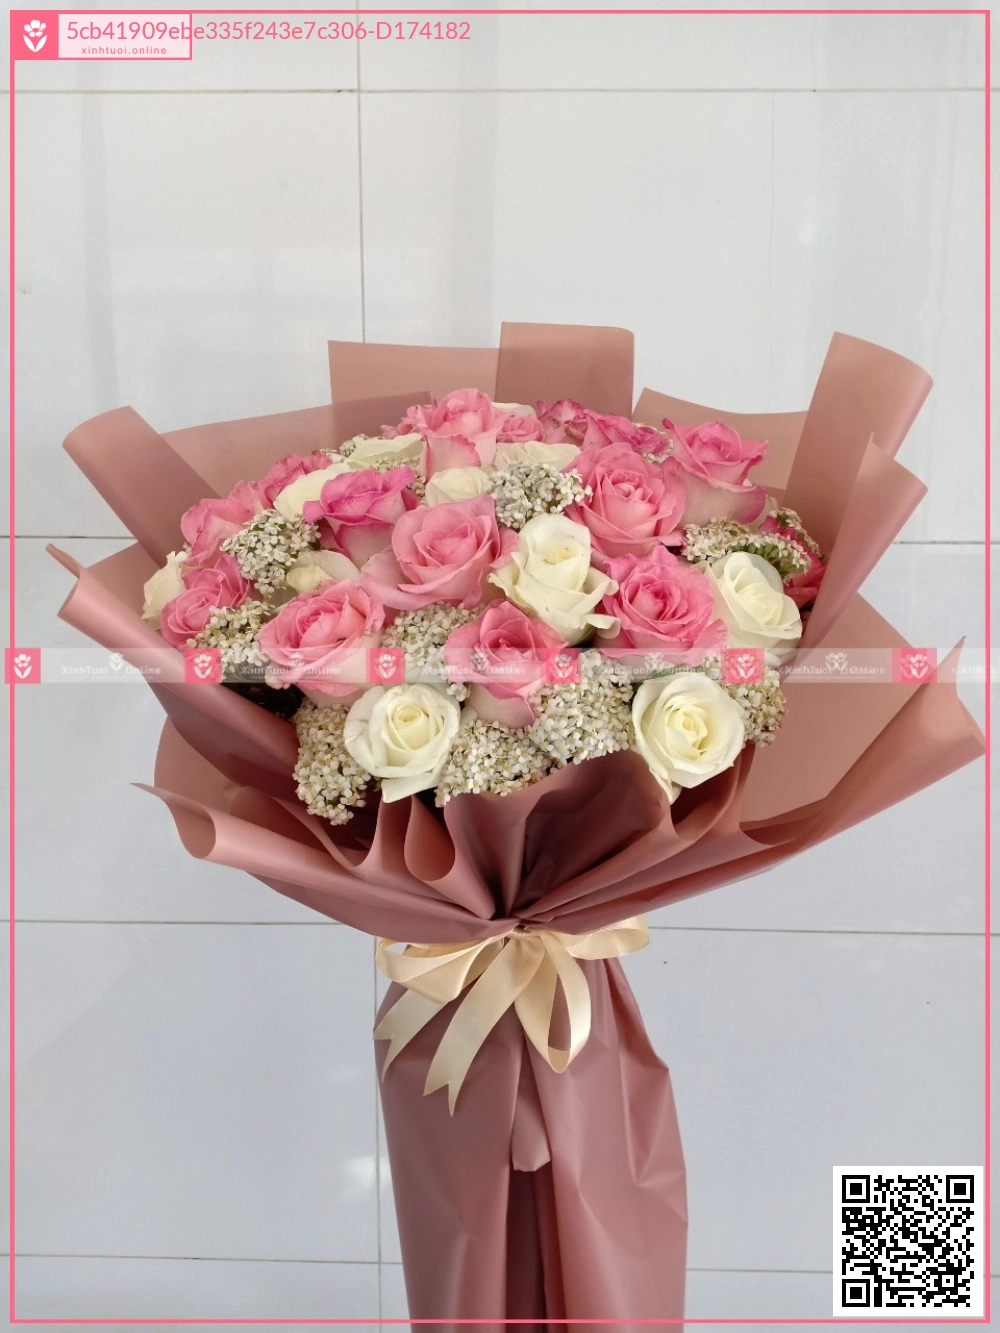 Happy Valentine - D174182 - xinhtuoi.online